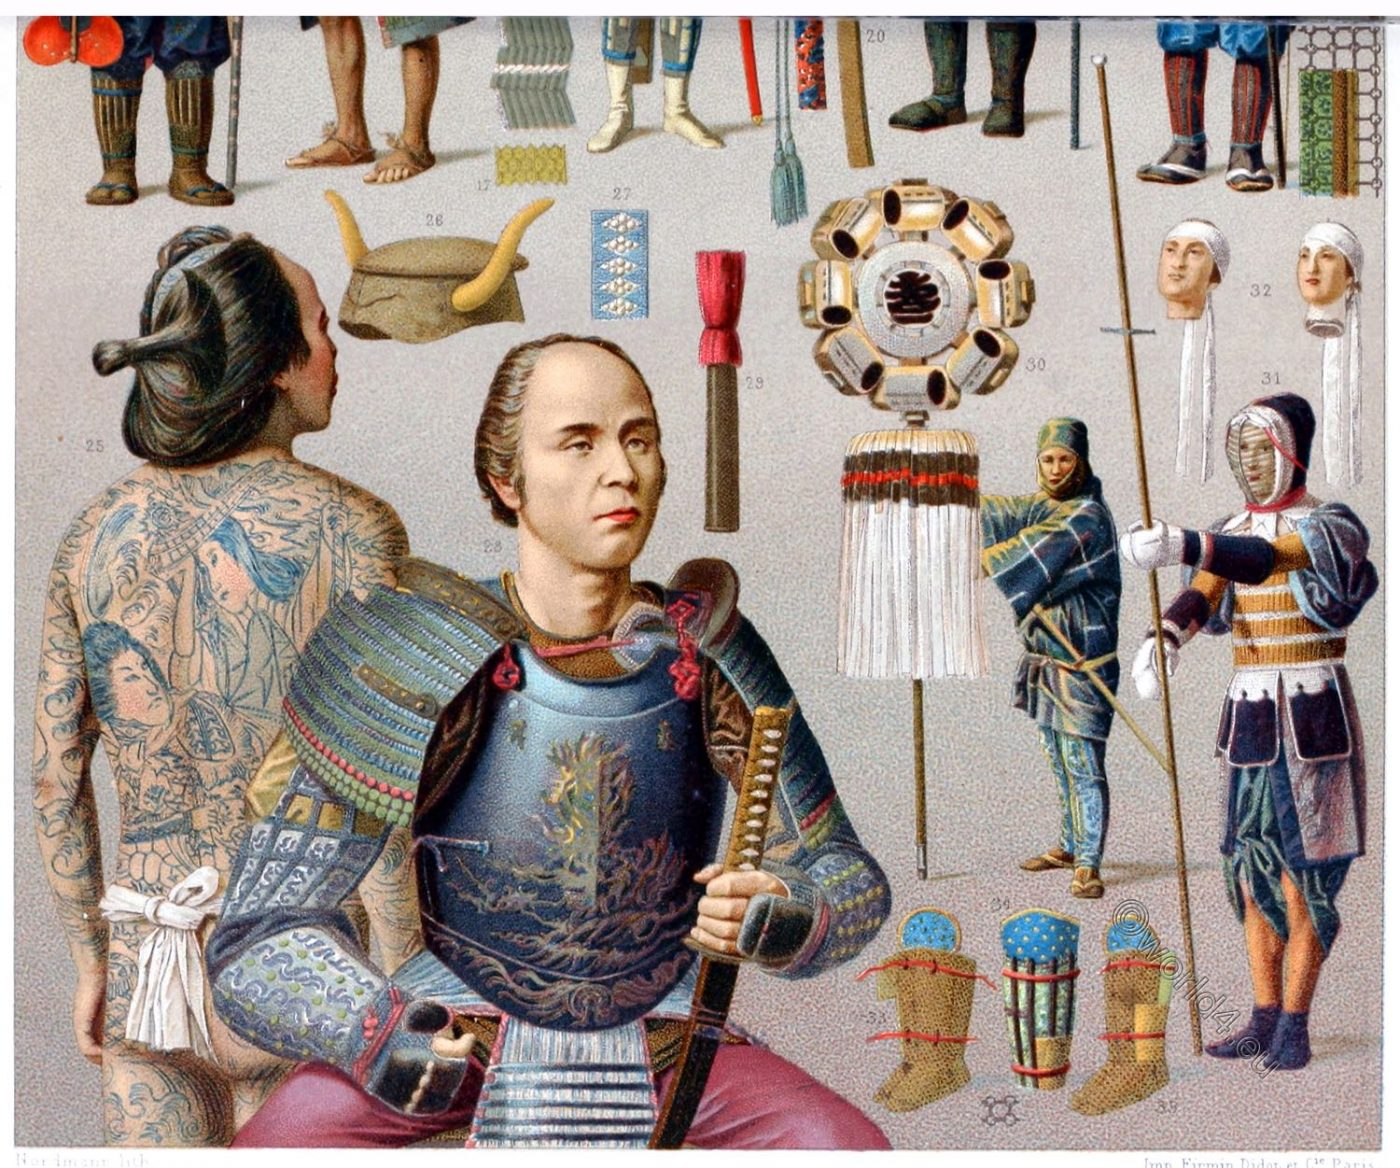 Japan, Yakunin, Japanese ,nobleman, Fireman, Archer, weapons, costumes, clothing,